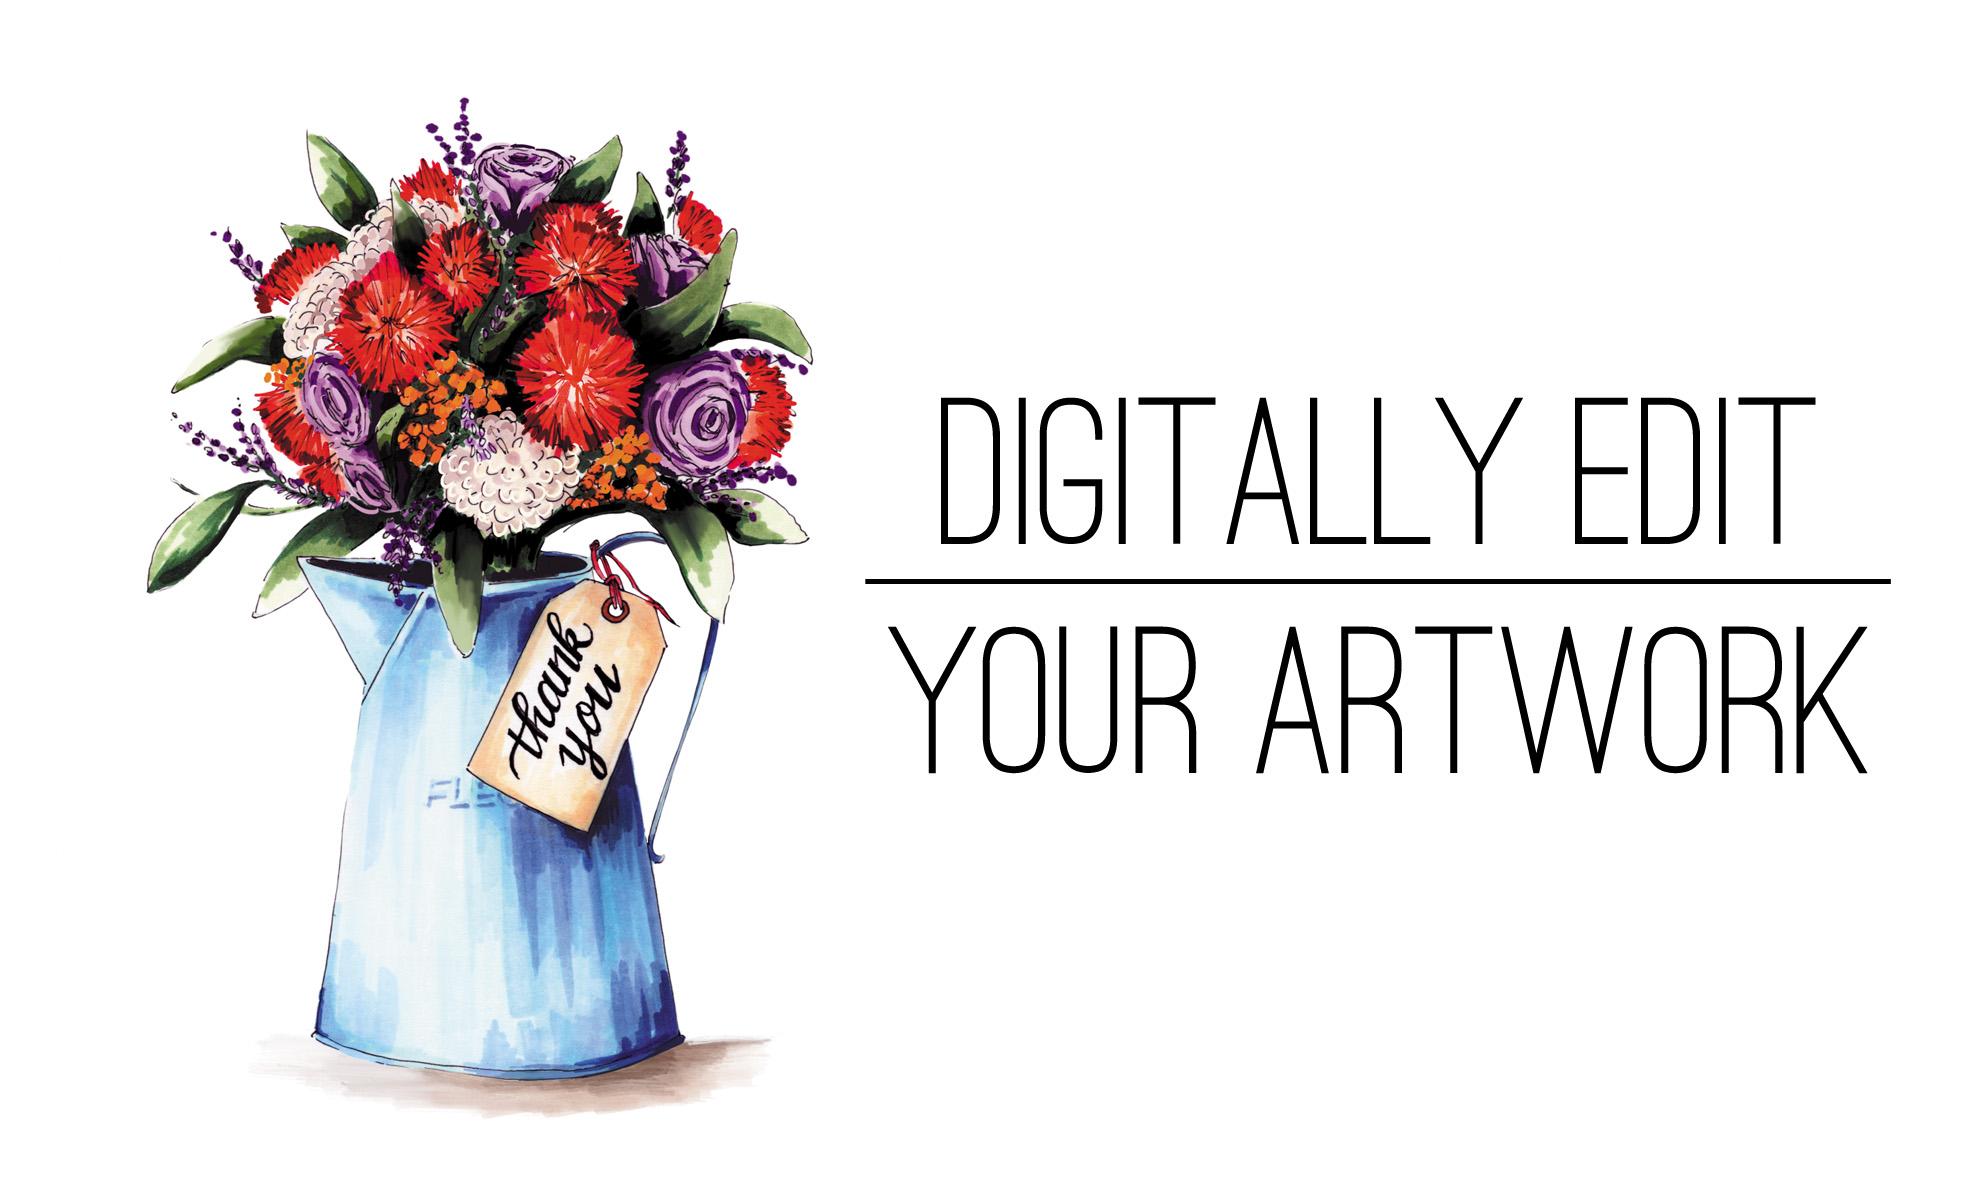 digitally-edit-your-artwork.jpg